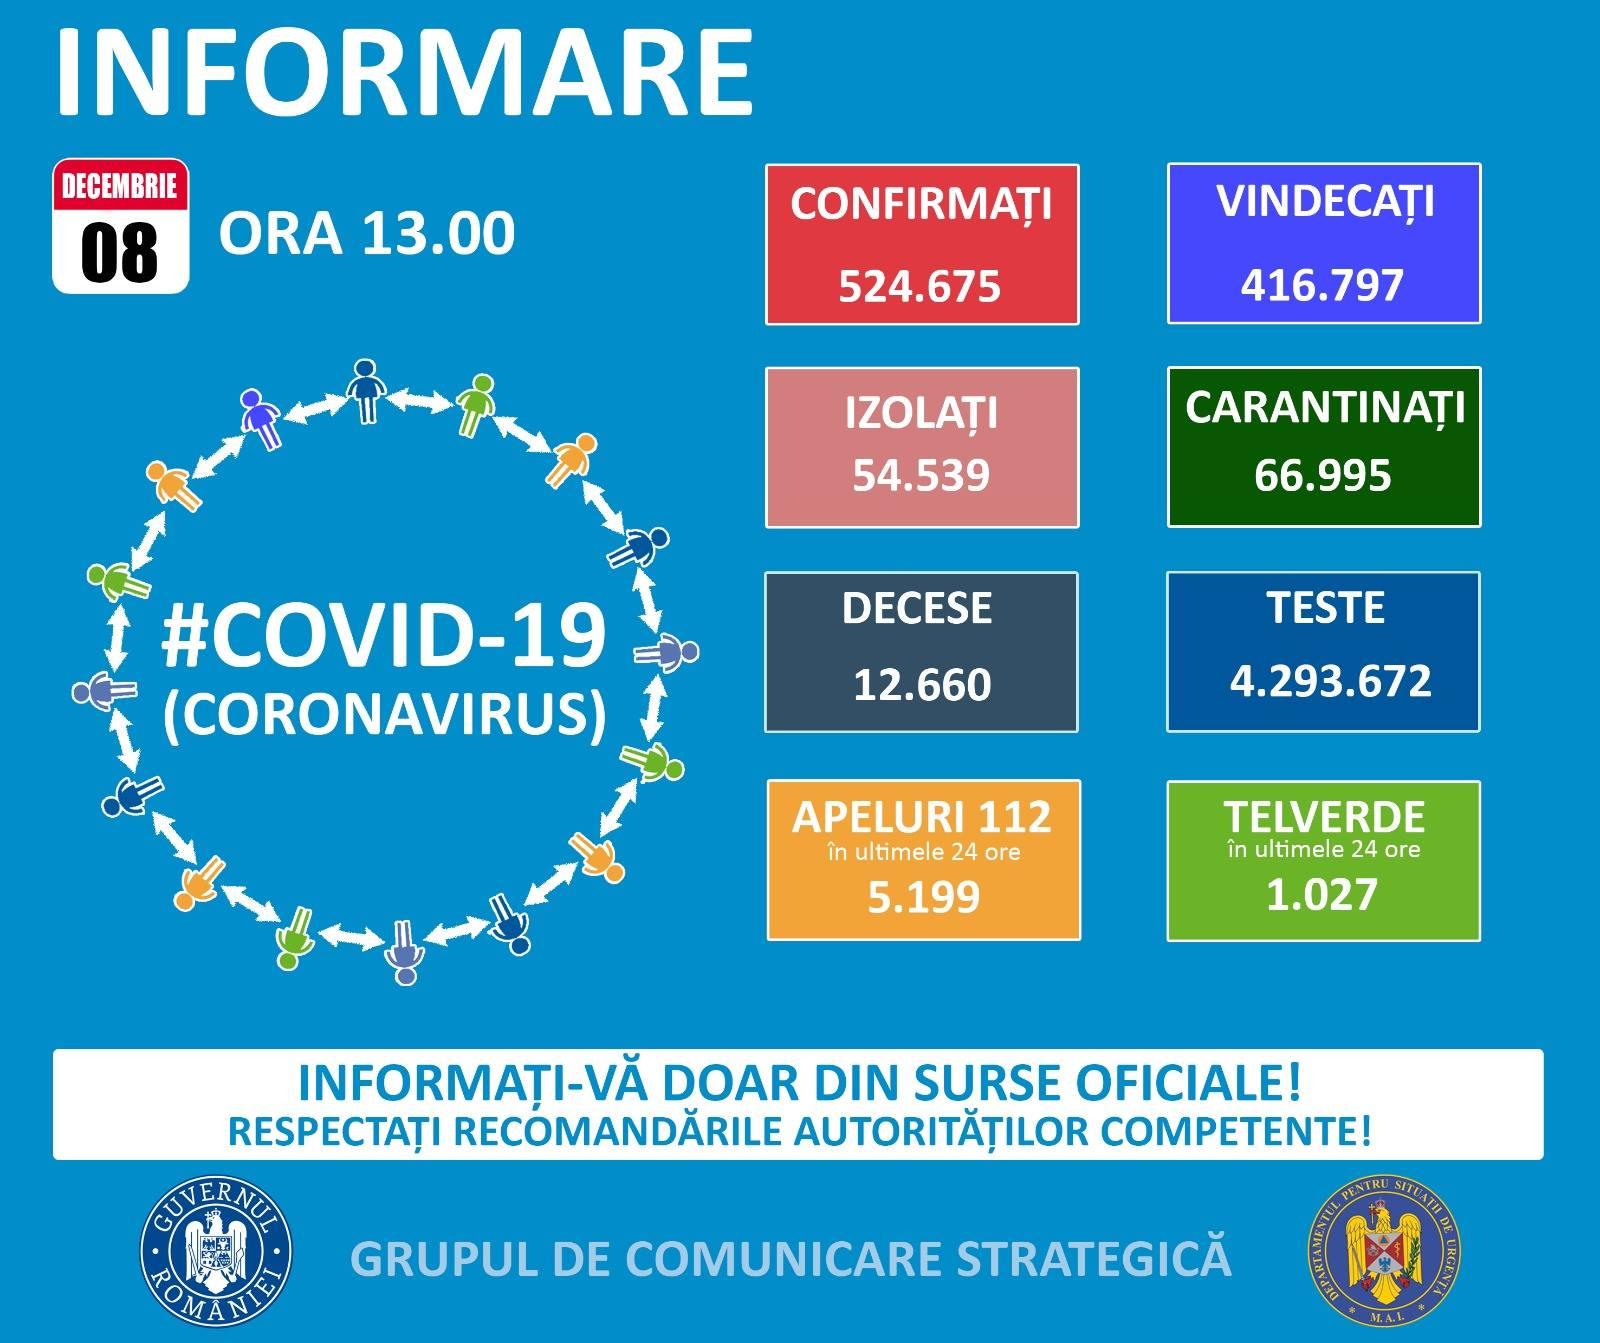 Ministerul Santatii coronavirus vindecati carantinati izolati grafic